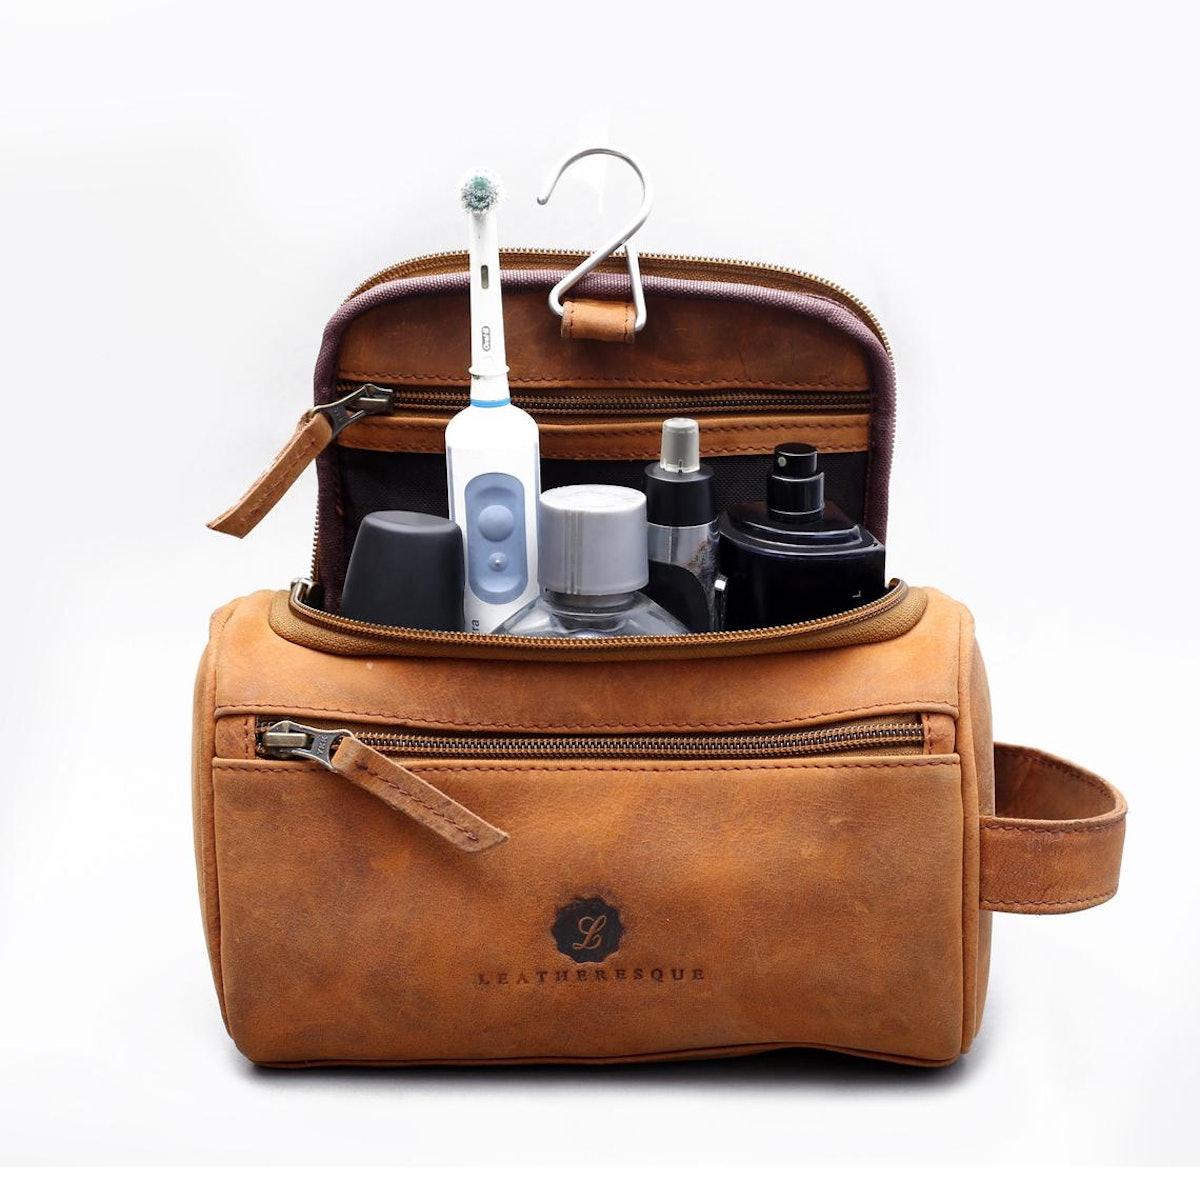 Nolita Leather Hanging Toiletry Bag